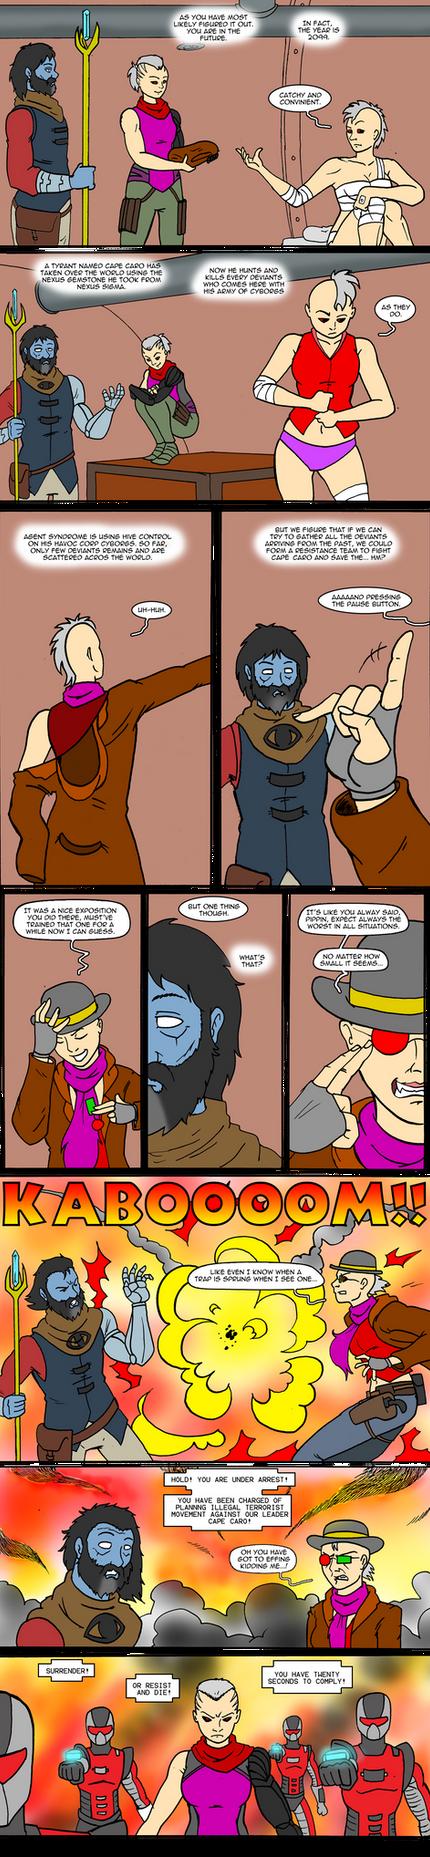 DU NEXUS SIGMA Chapter 3: DU 2099 Page 3/5 by ViktorMatiesen